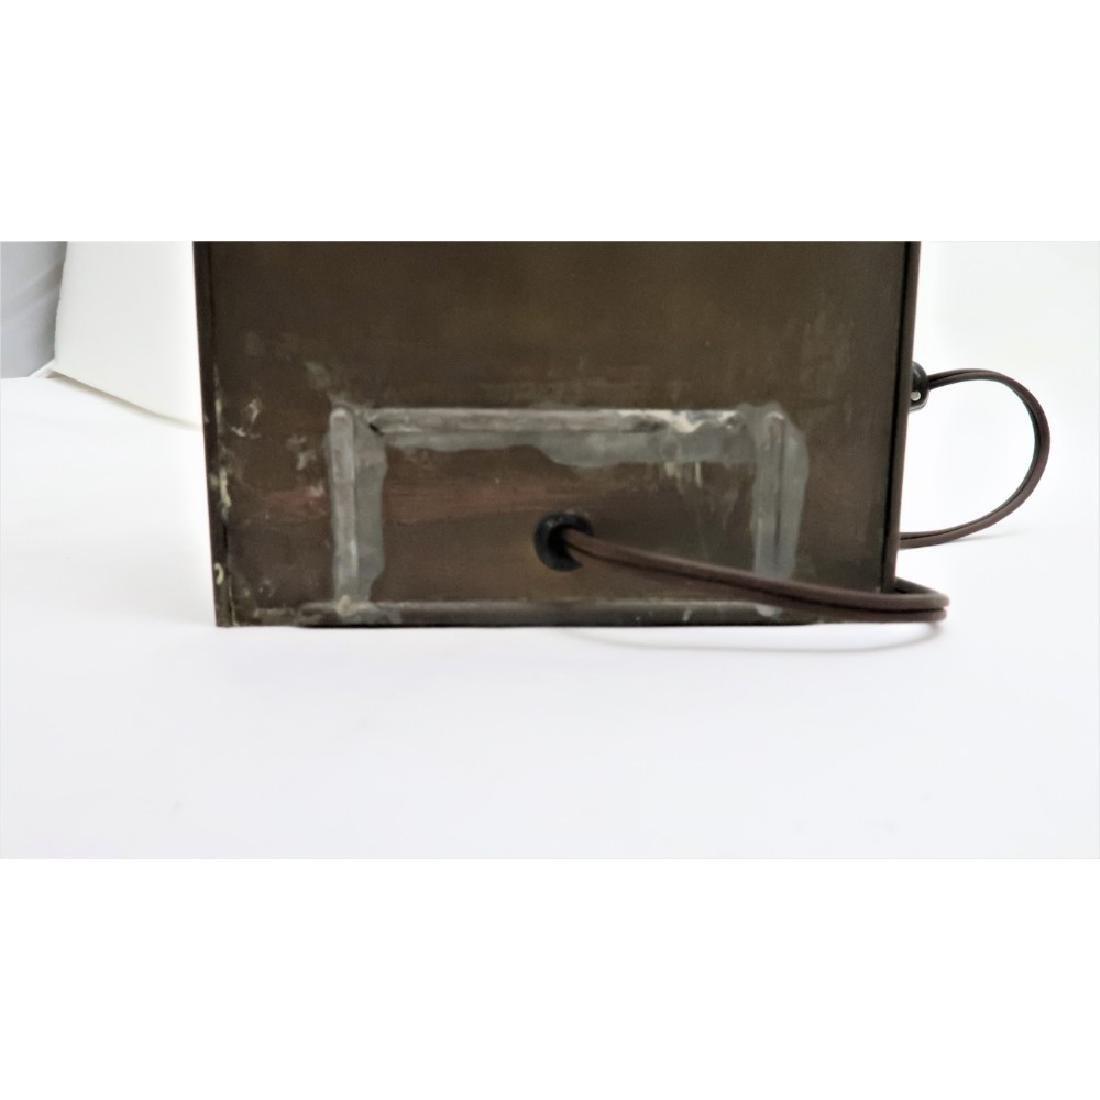 Old Brass Lantern - Electrified - Glass shade is wavy - 5